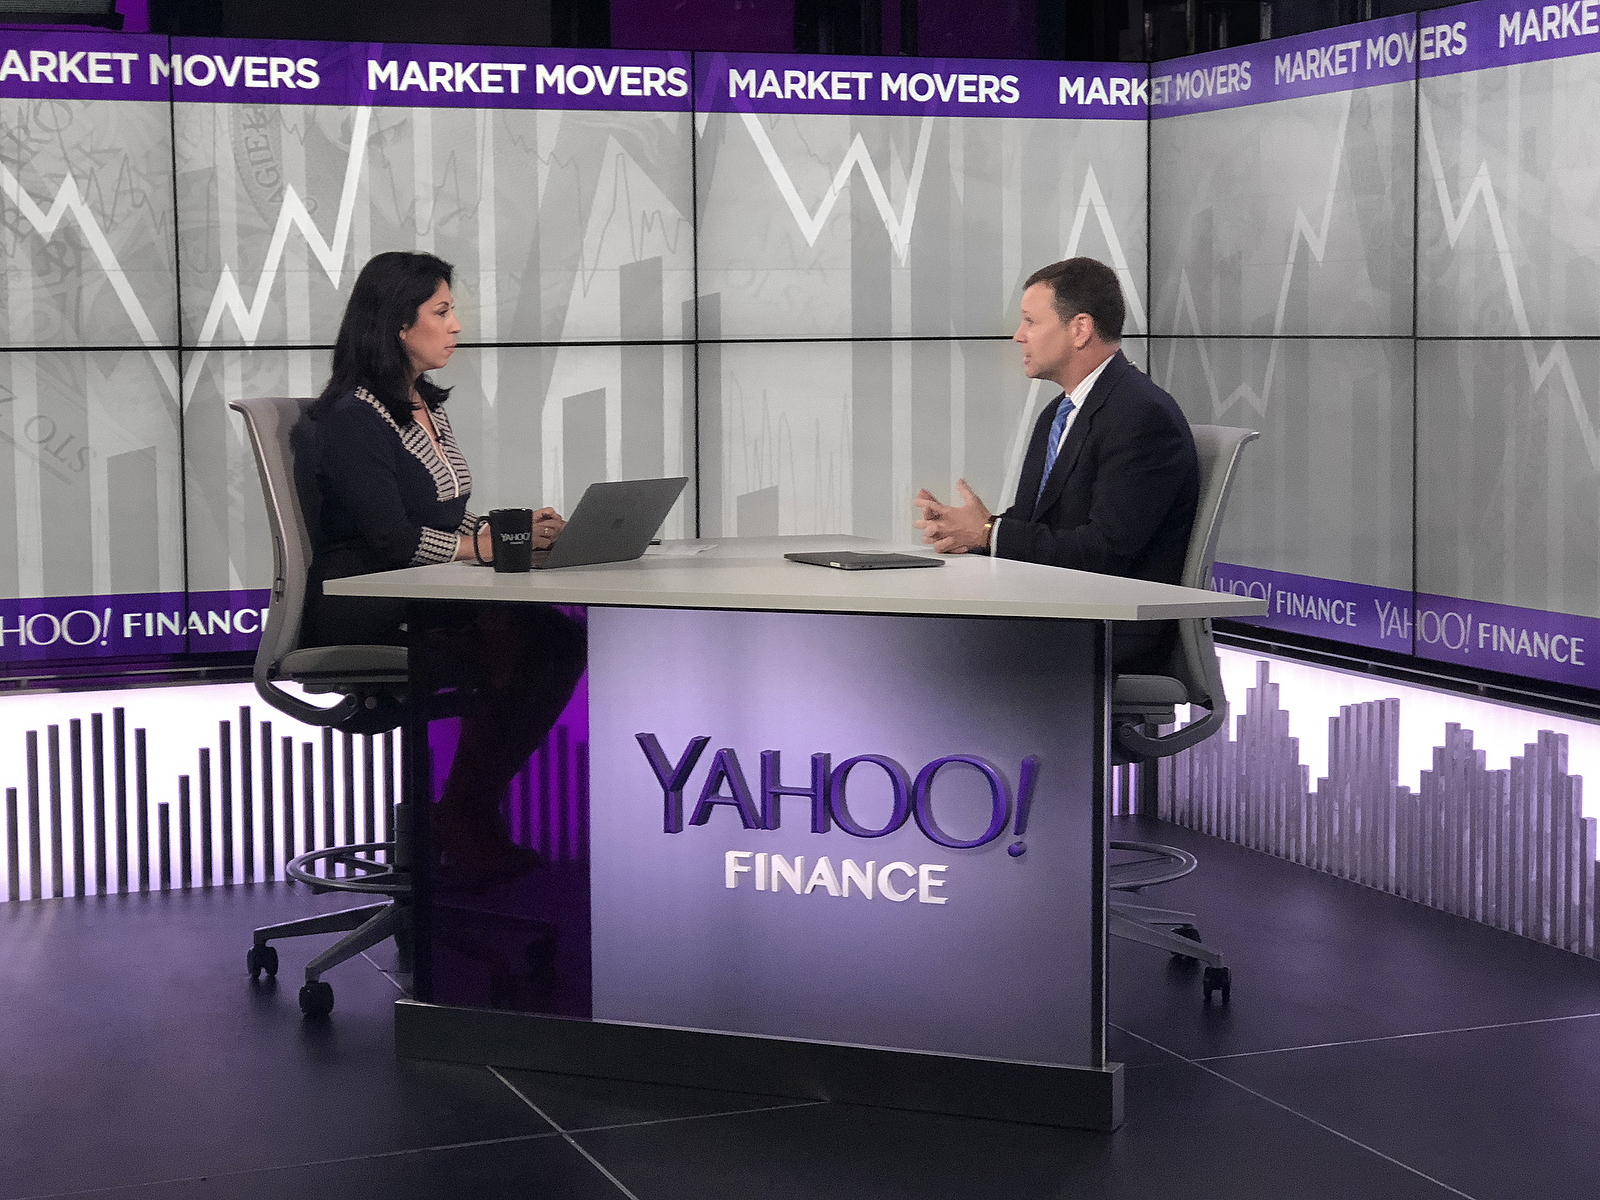 ncs_Yahoo-Finance-TV-Studio_0002